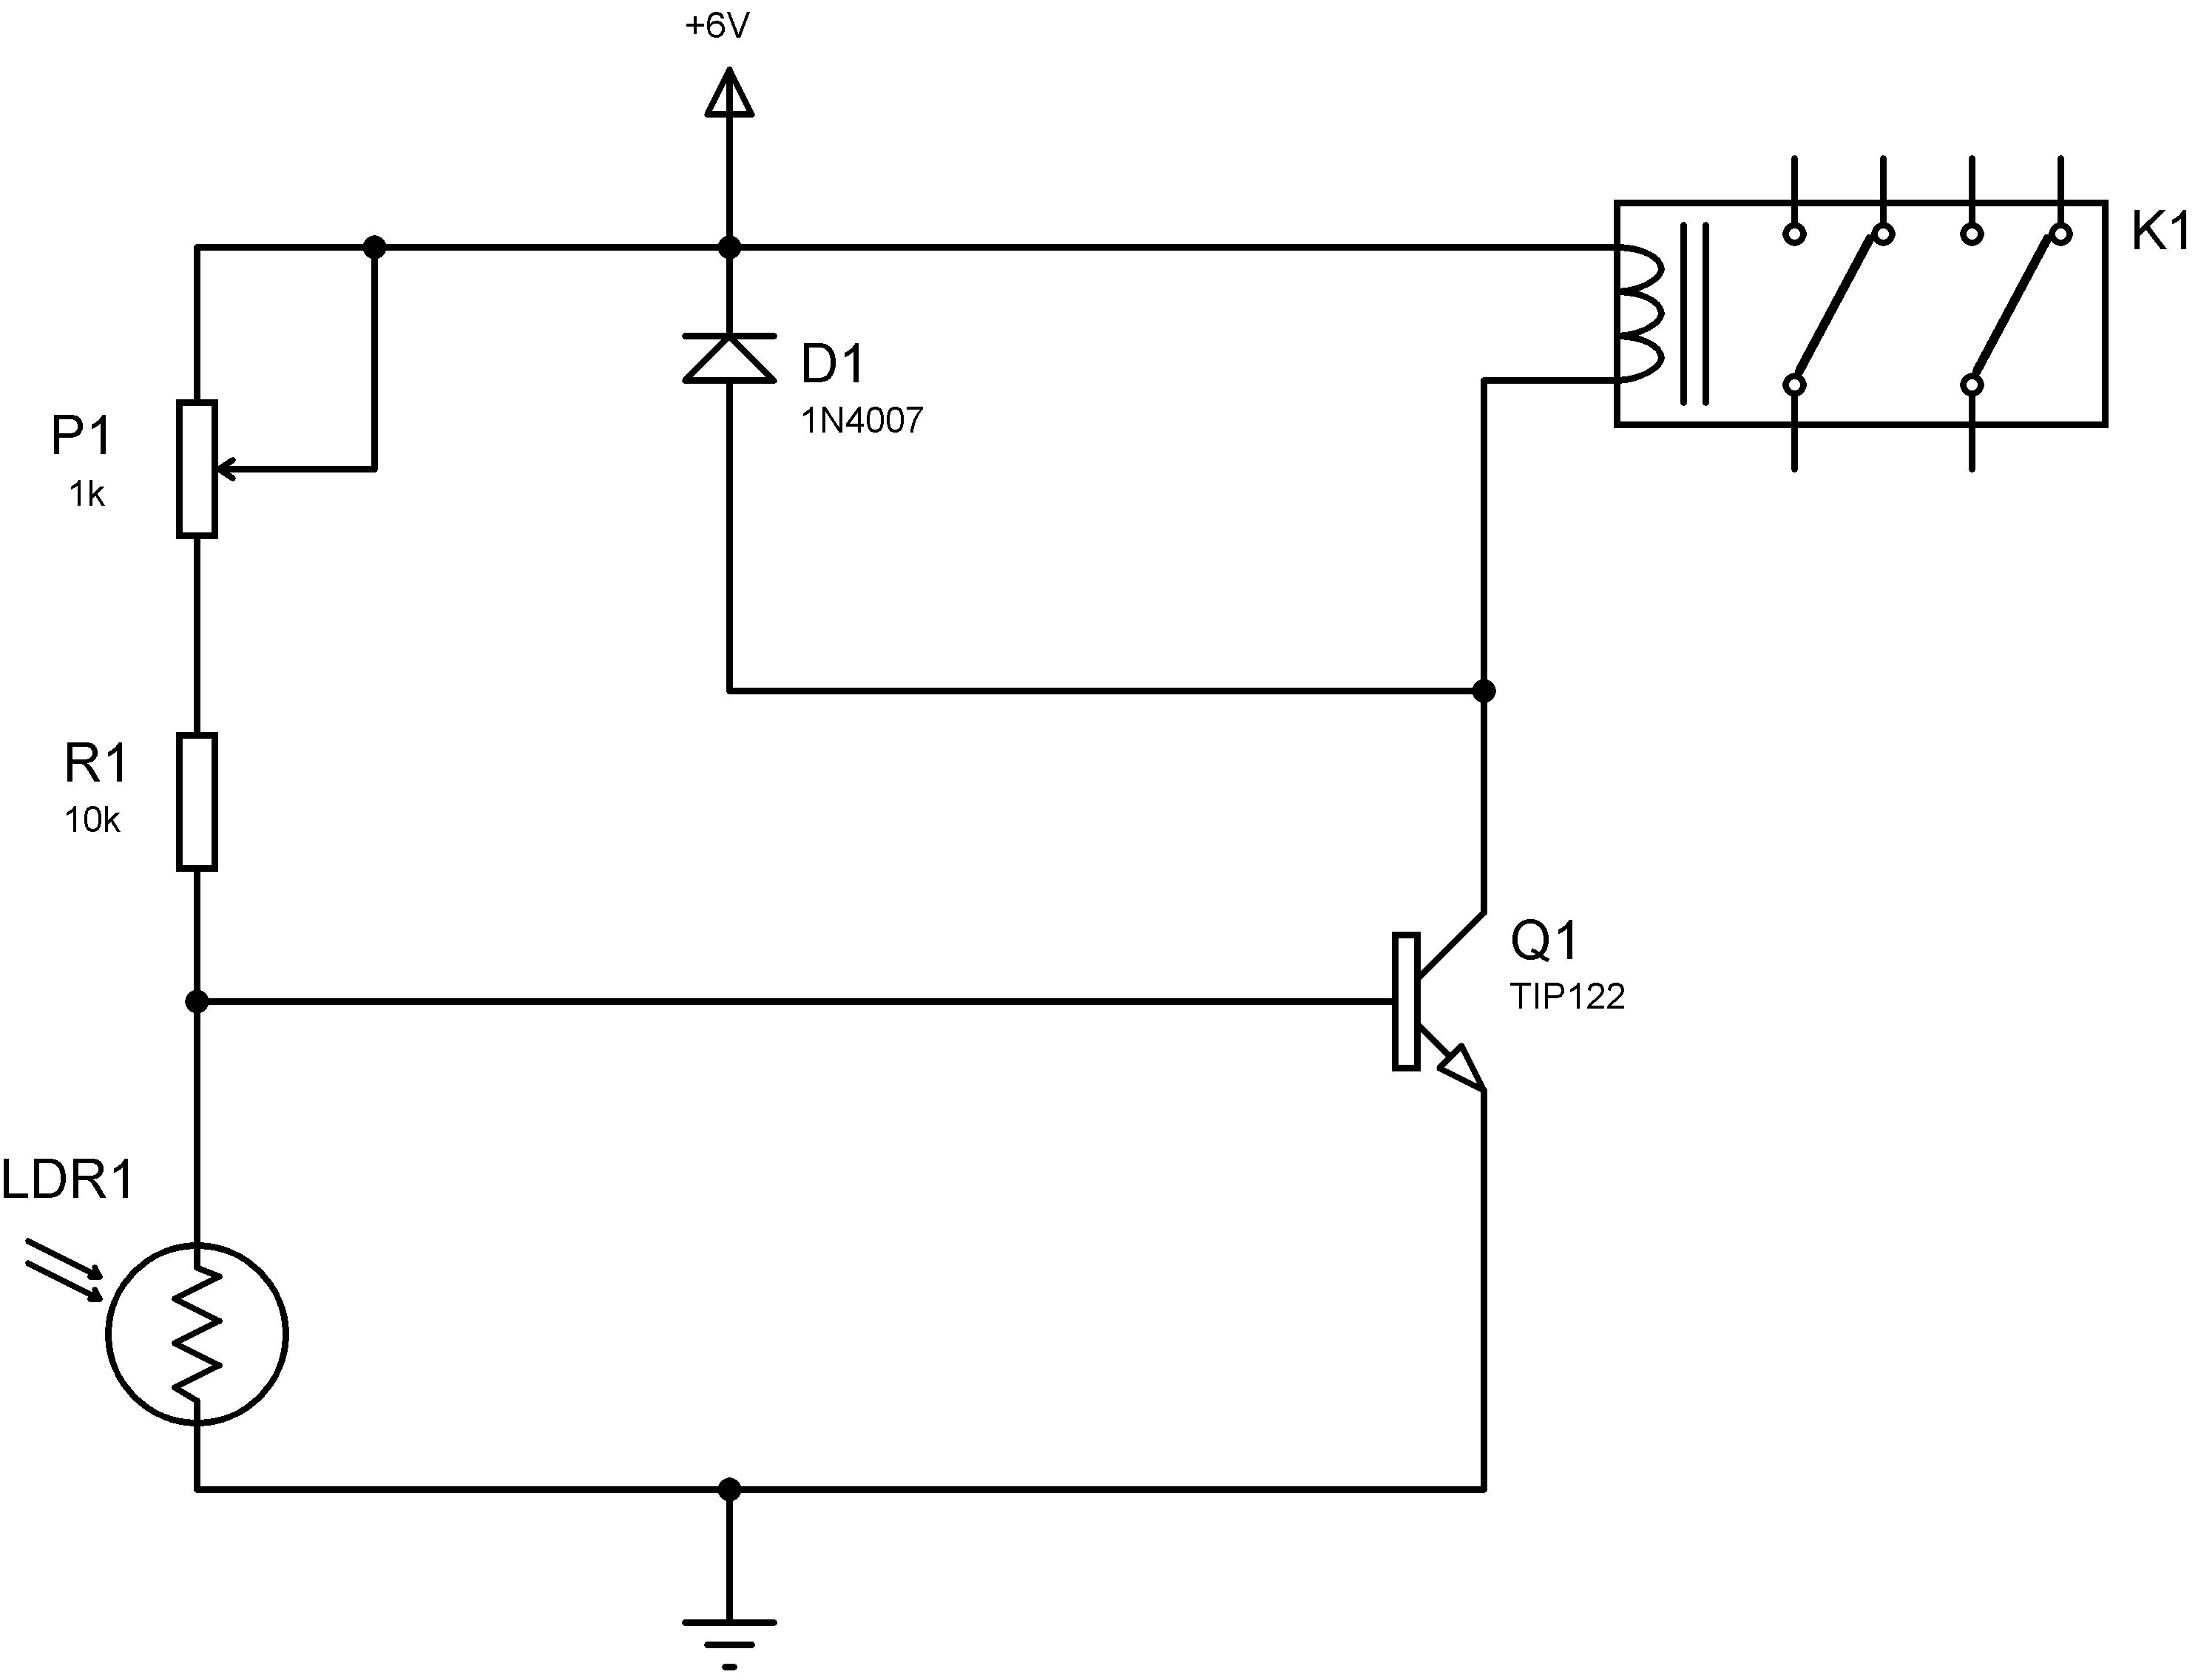 Circuito Ldr : Wrkits engenharia eletrônica sensor de obstáculo para